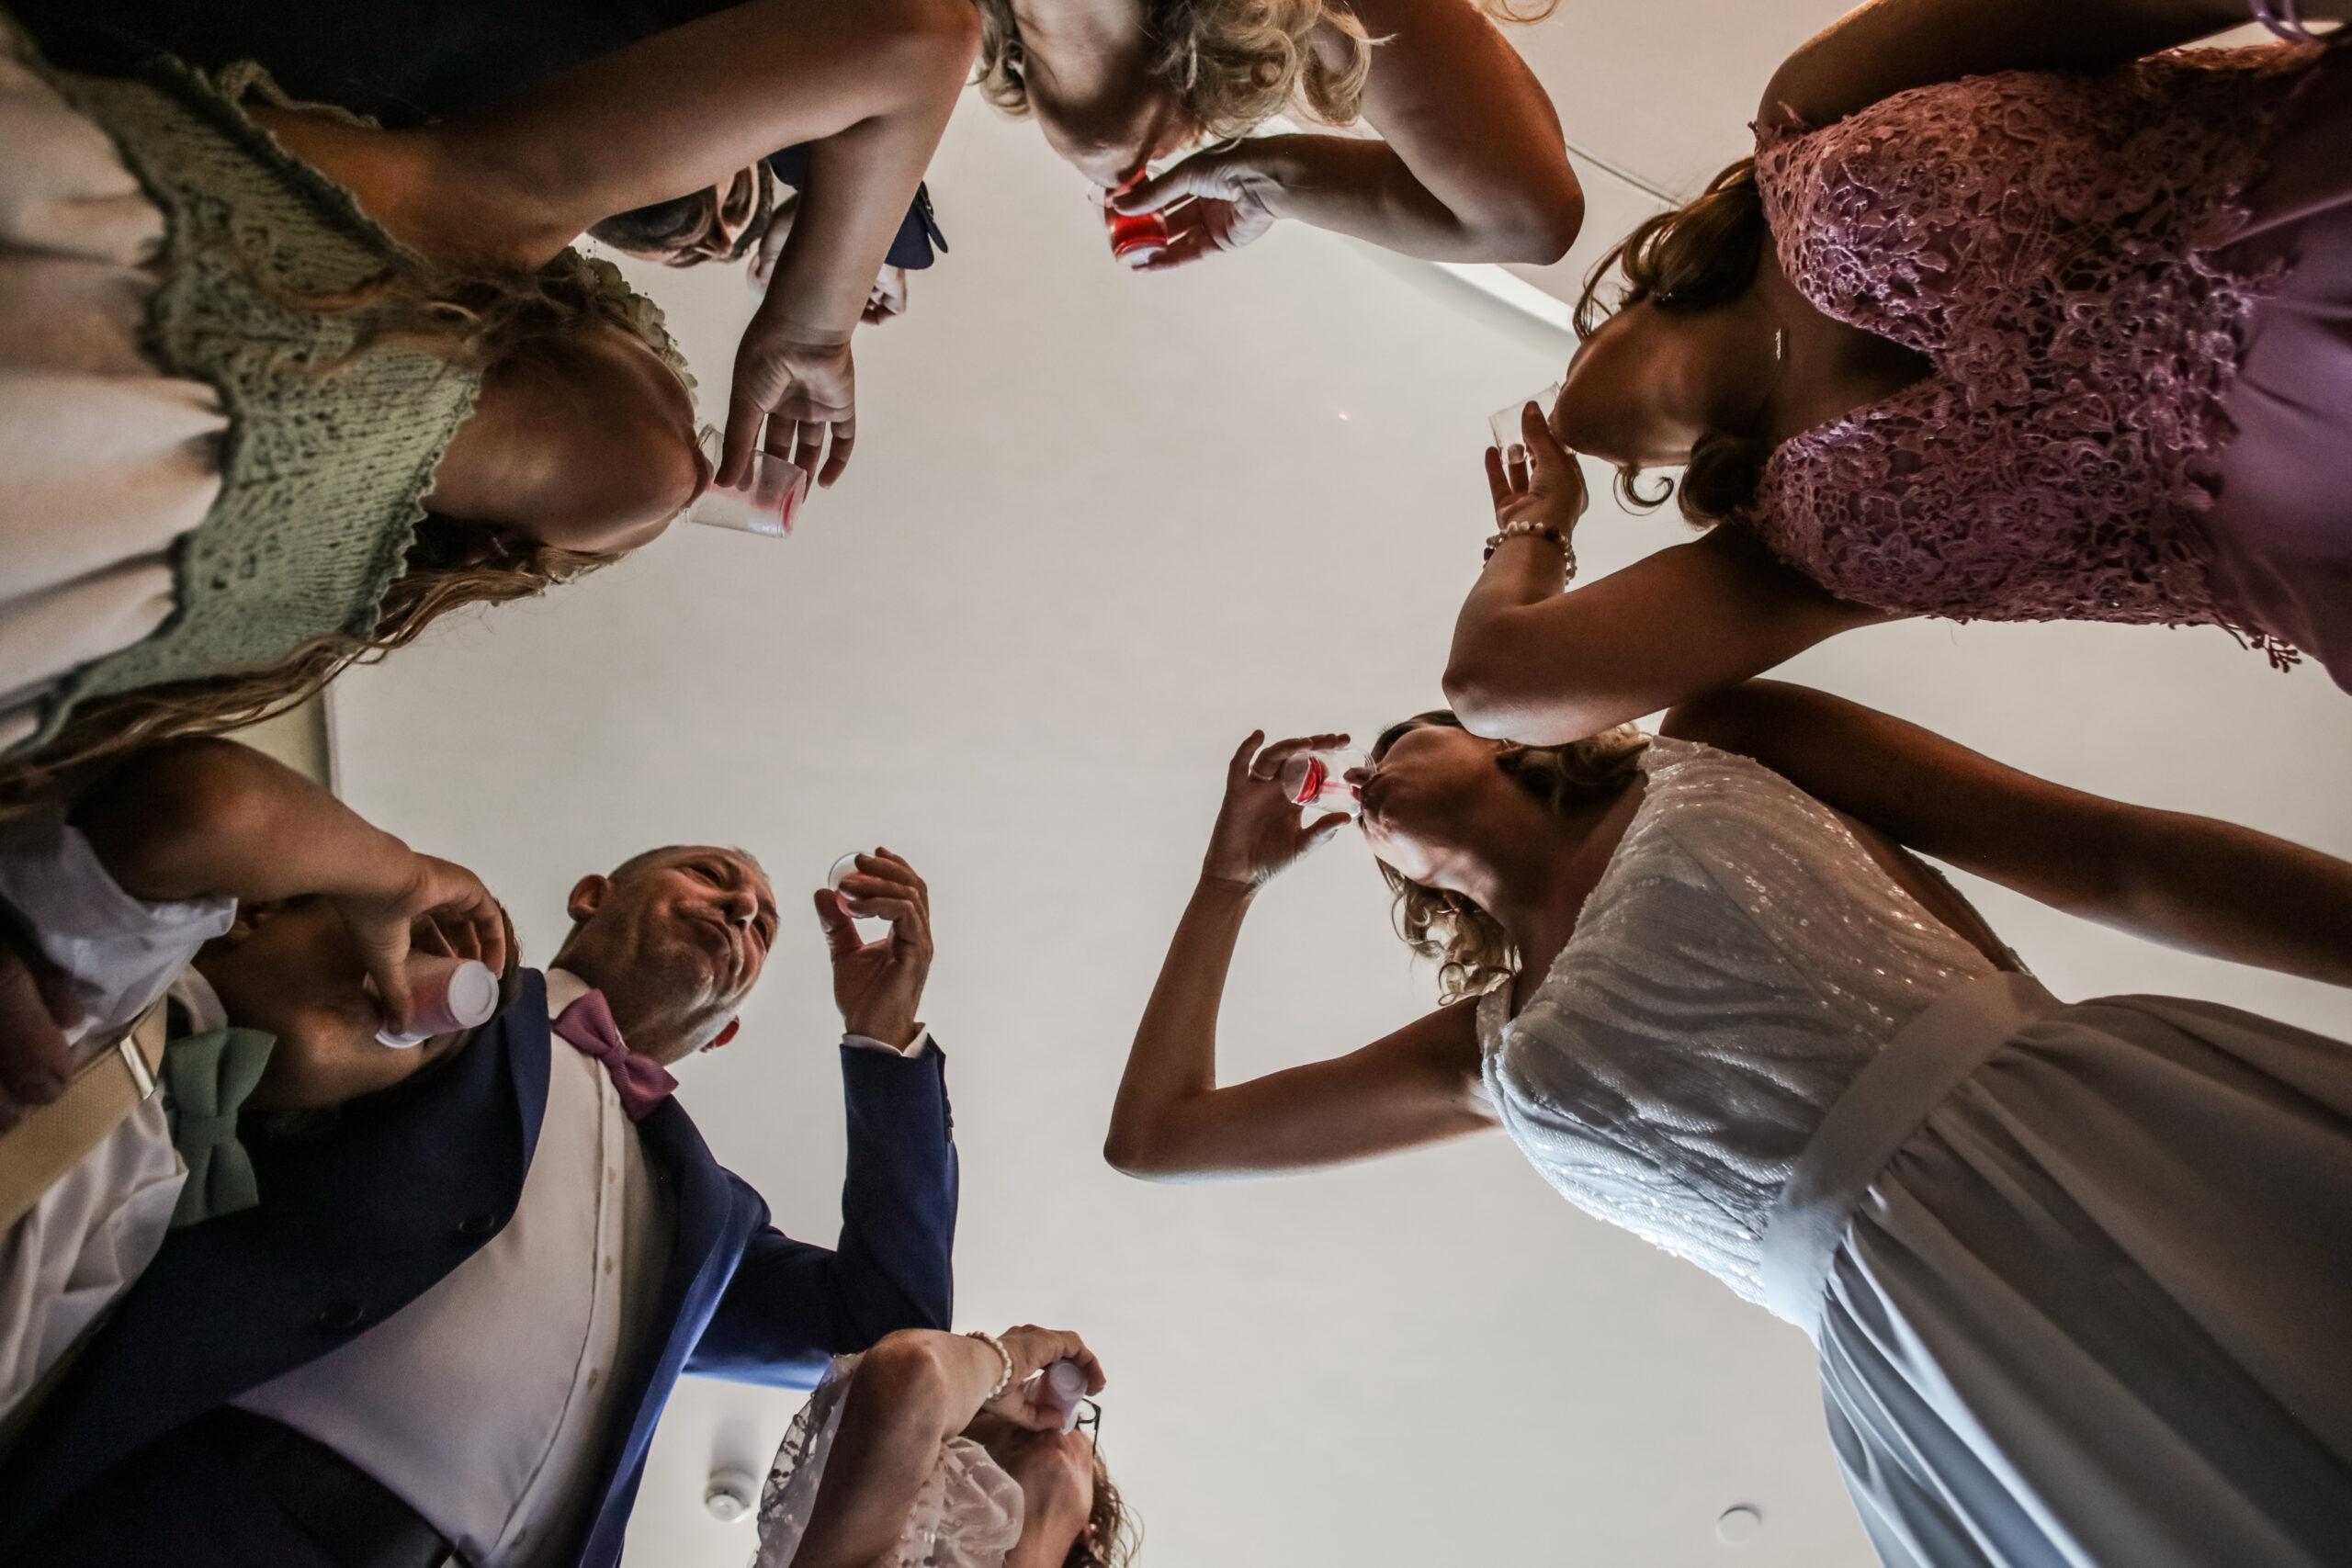 boda barcelona, barcelona boda, wedding barcelona, get married barcelona, barcelona wedding planner, barcelona wedding day, wedding planner, wedding inspo, wedding inspiration,wedding decor, traditional wedding, real wedding, wedding day, bride, groom, happiness, family, love, kids, cool, awesomeboda barcelona, barcelona boda, wedding barcelona, get married barcelona, barcelona wedding planner, barcelona wedding day, wedding planner, wedding inspo, wedding inspiration,wedding decor, traditional wedding, real wedding, wedding day, bride, groom, happiness, family, love, kids, cool, awesome